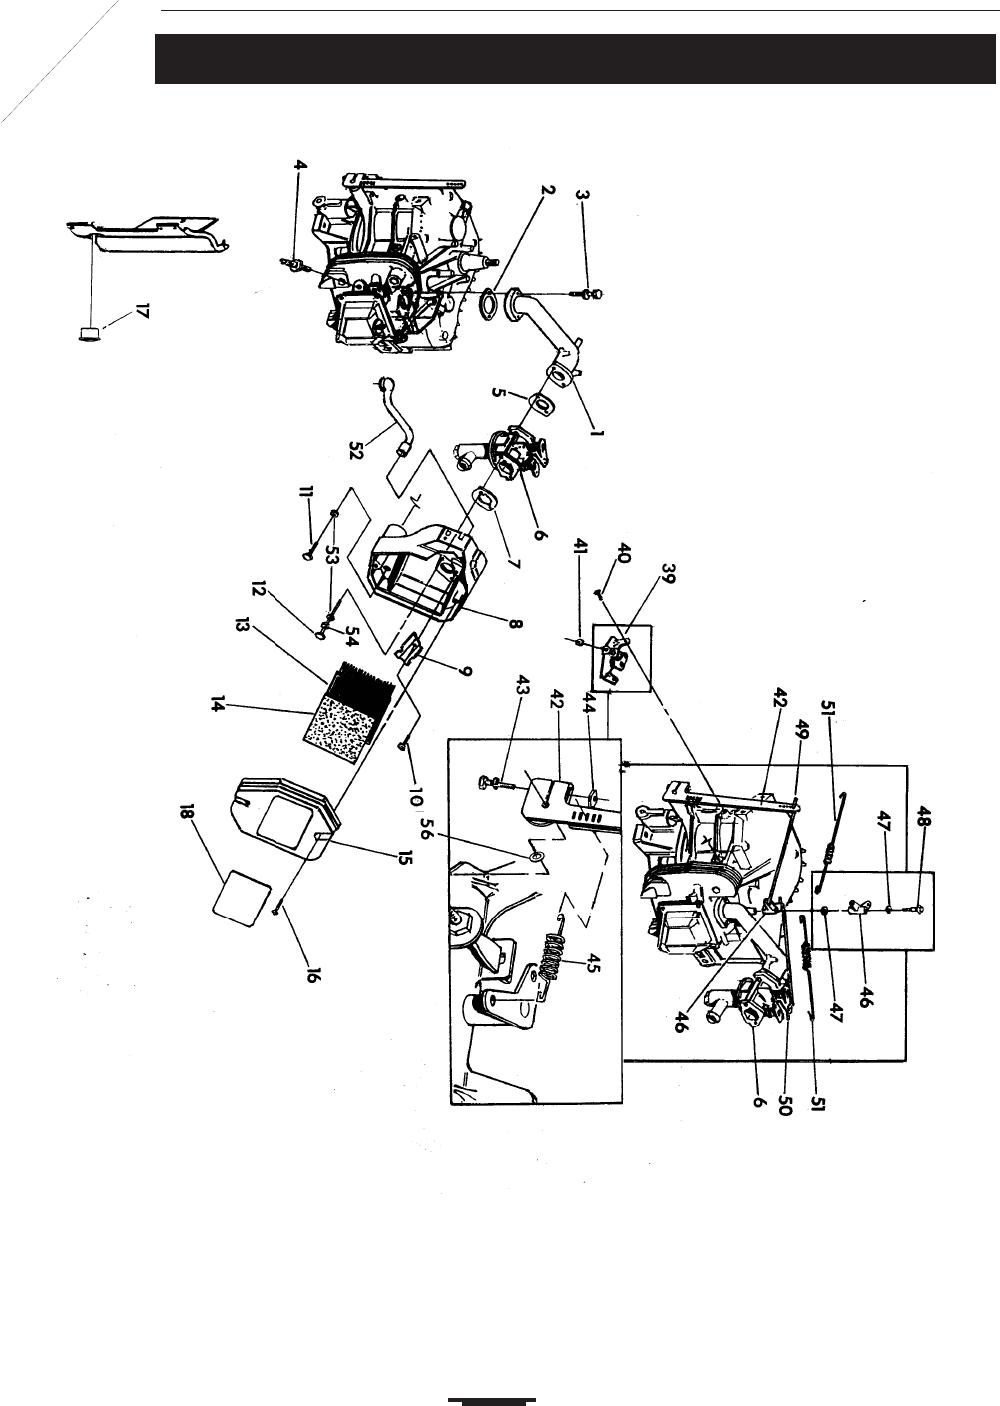 Generac 00919 0 Owners Manual A5596 1